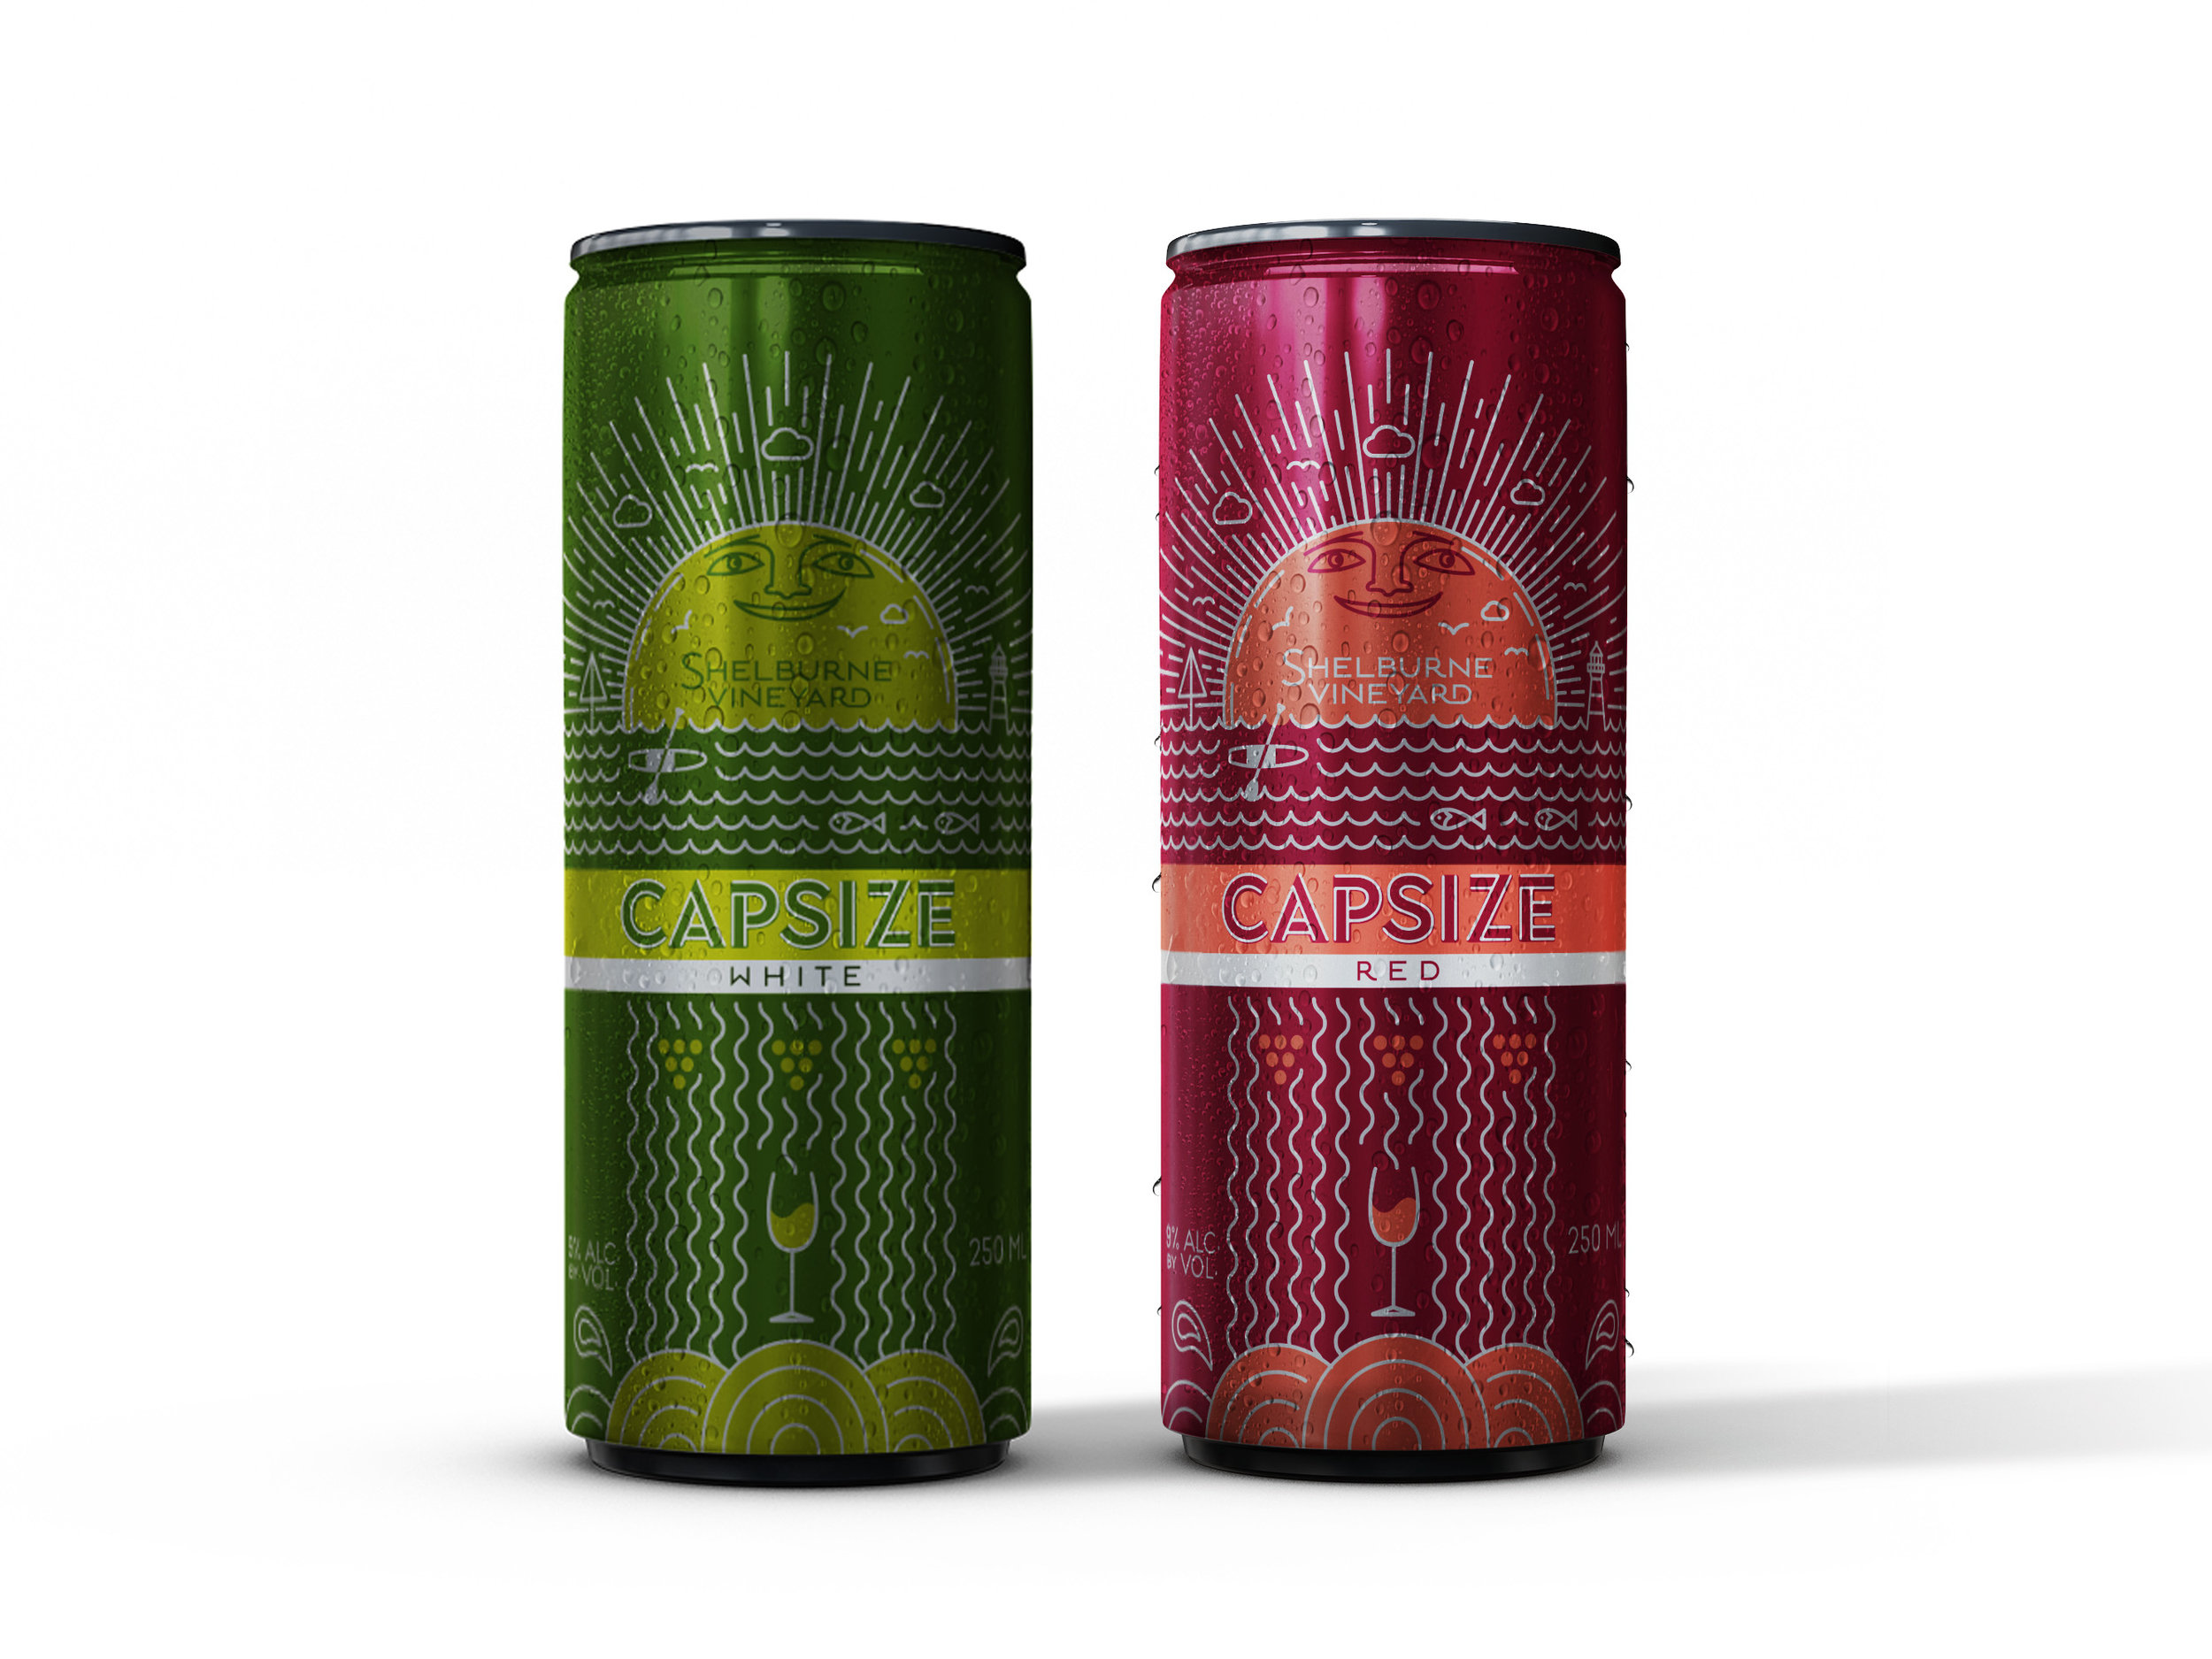 Shelburne Vineyard Capsize Packaging